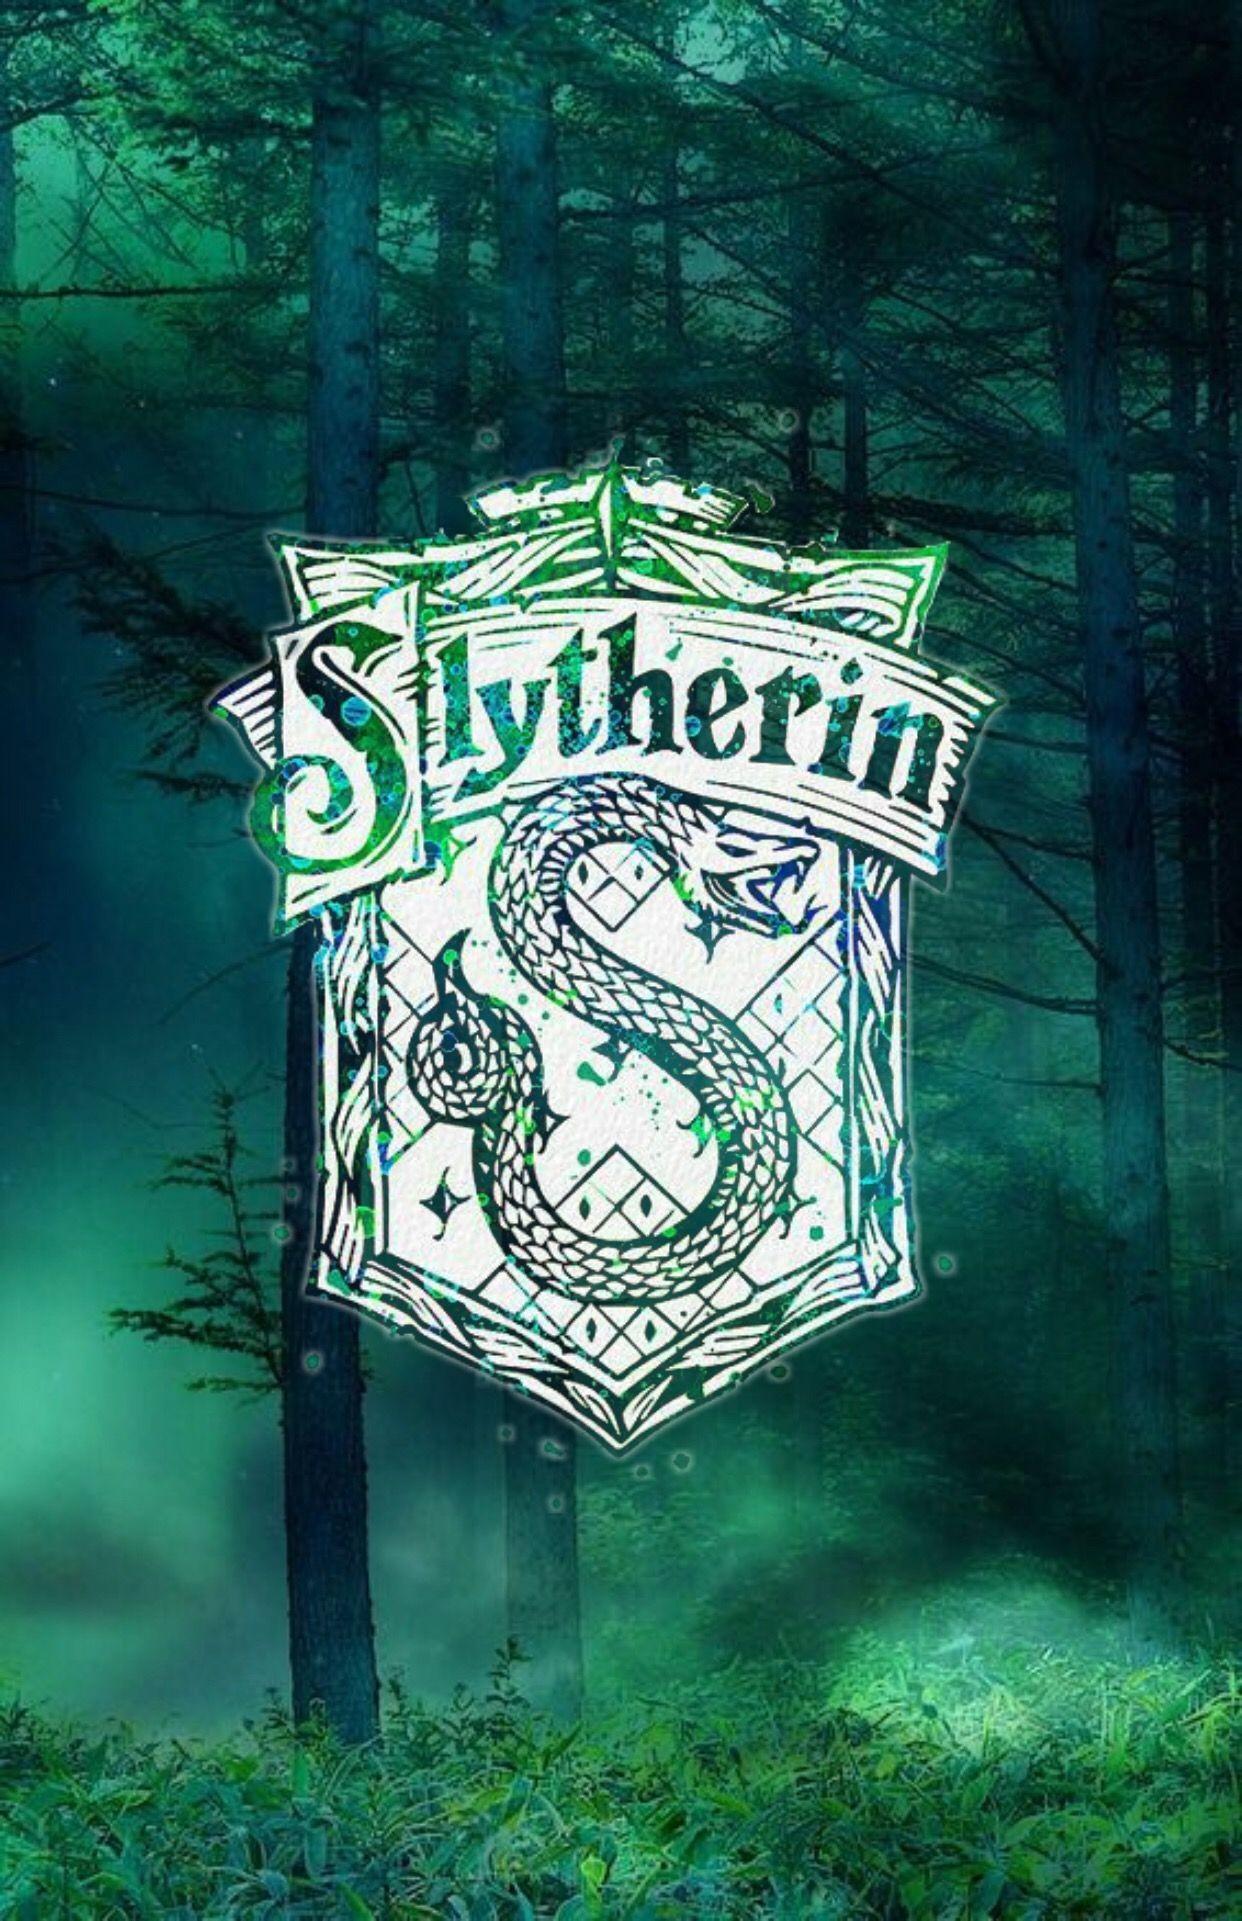 Harry Potter - Harry Potter Wallpaper Slytherin - HD Wallpaper